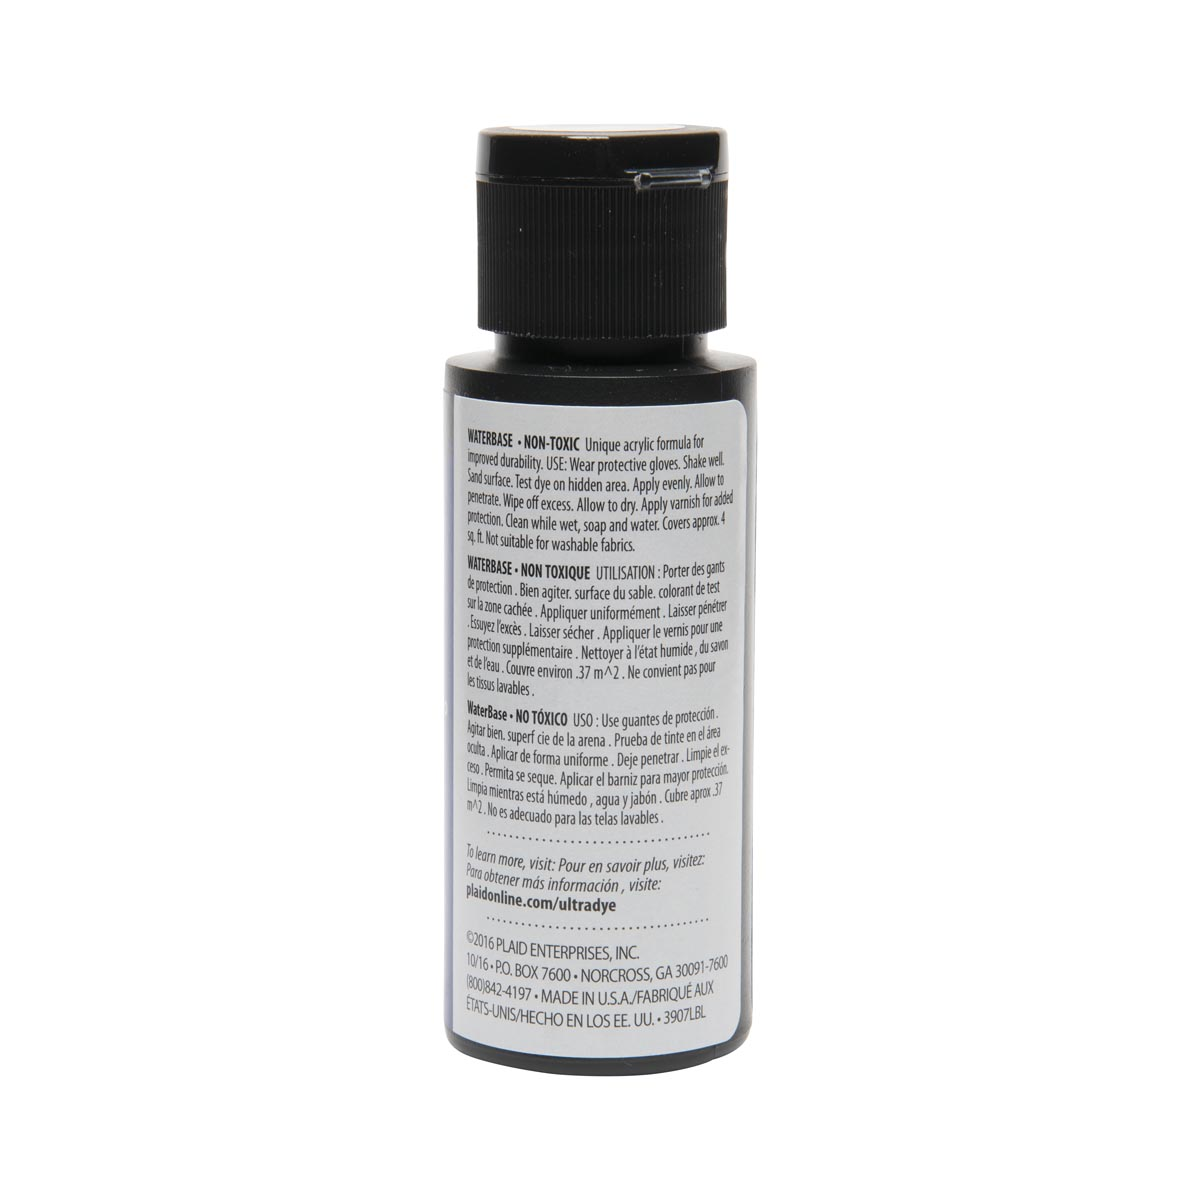 FolkArt ® Ultra Dye™ Colors - Rendezvous, 2 oz.